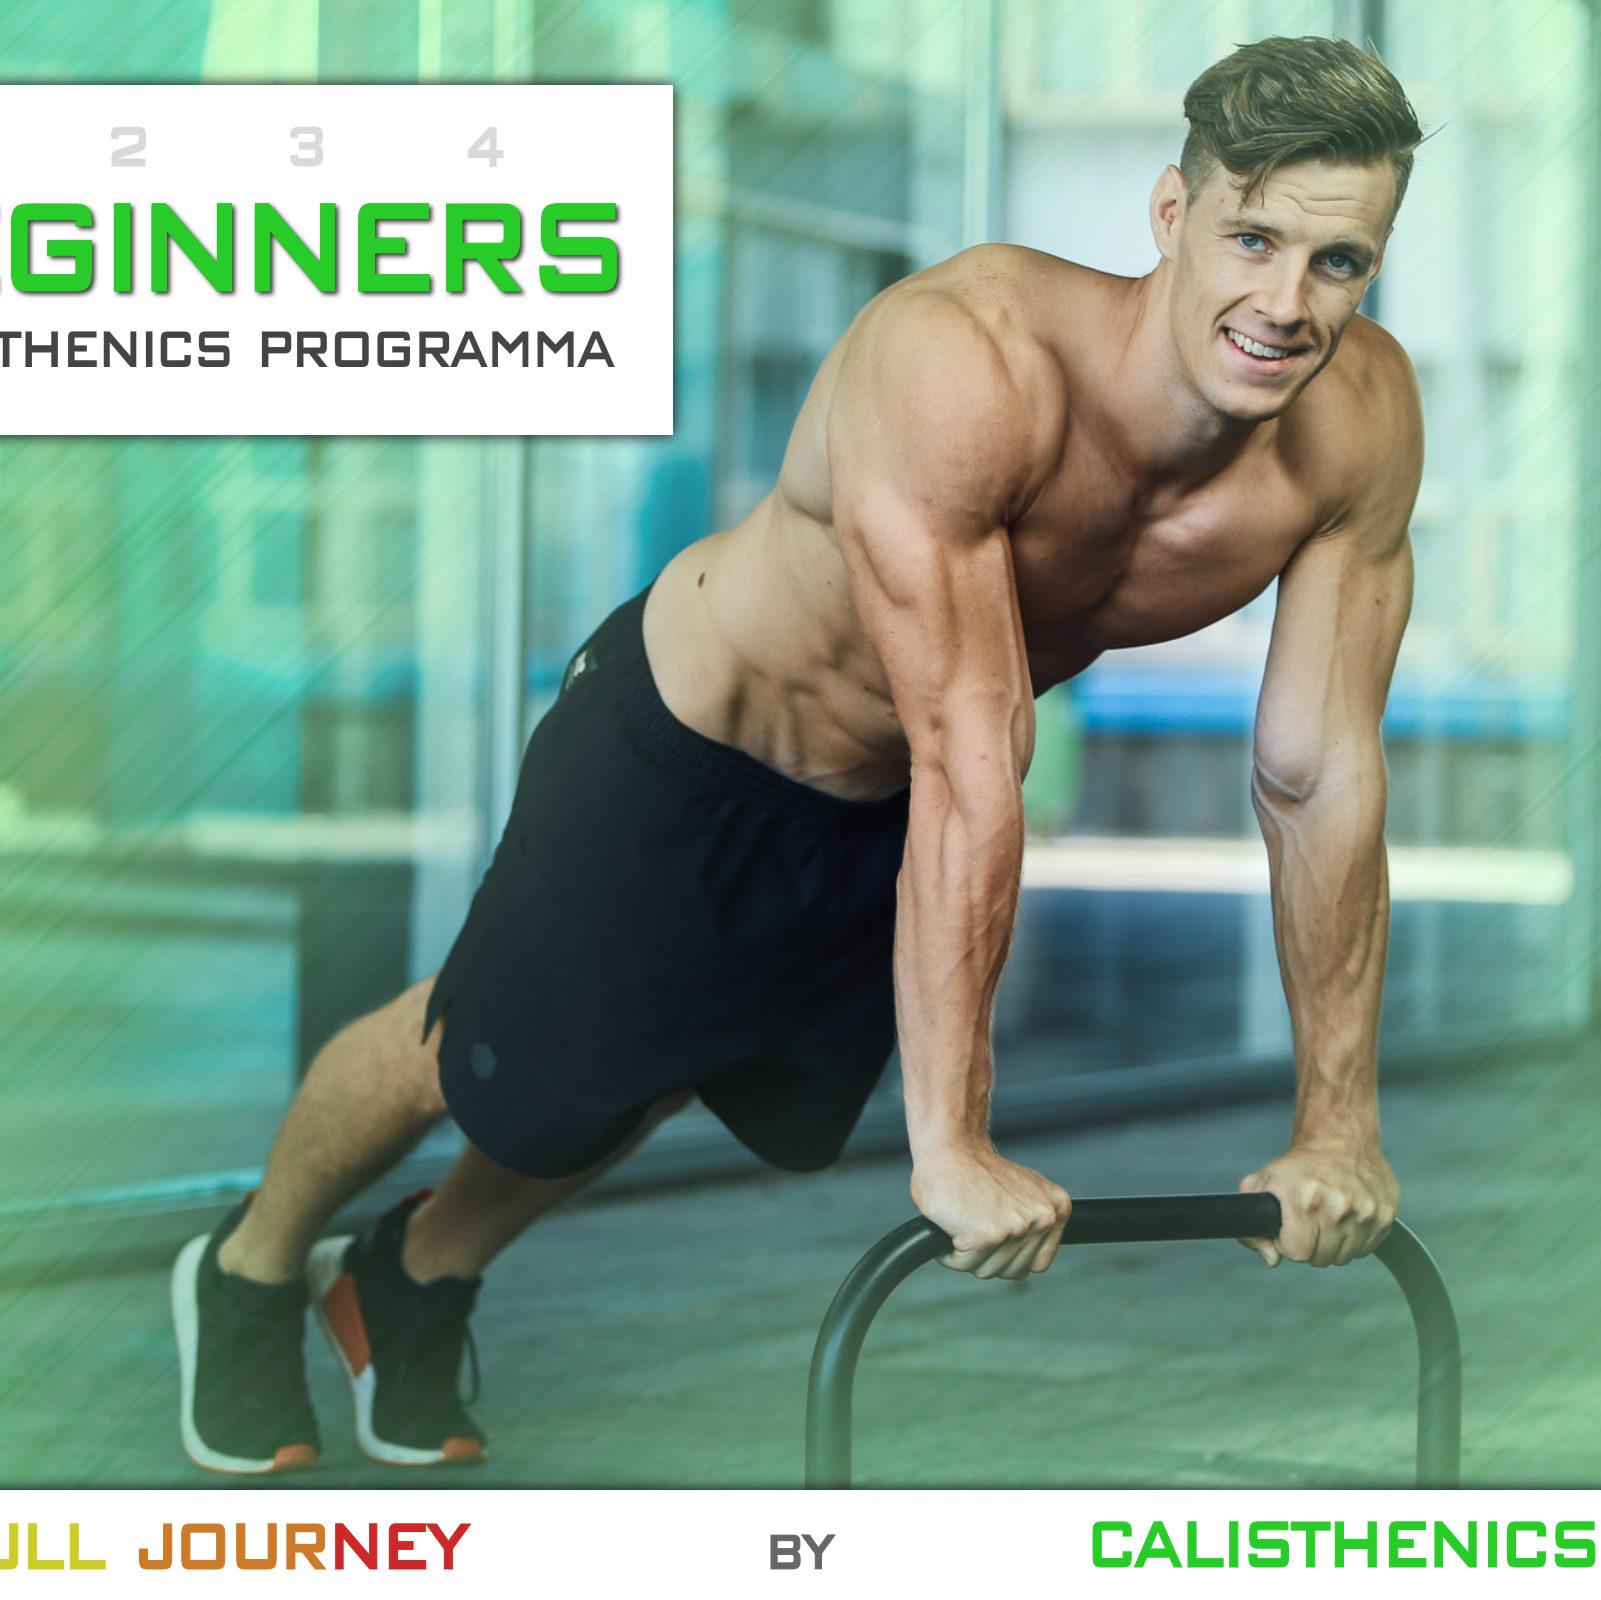 Beginners Calisthenics Workout Programma